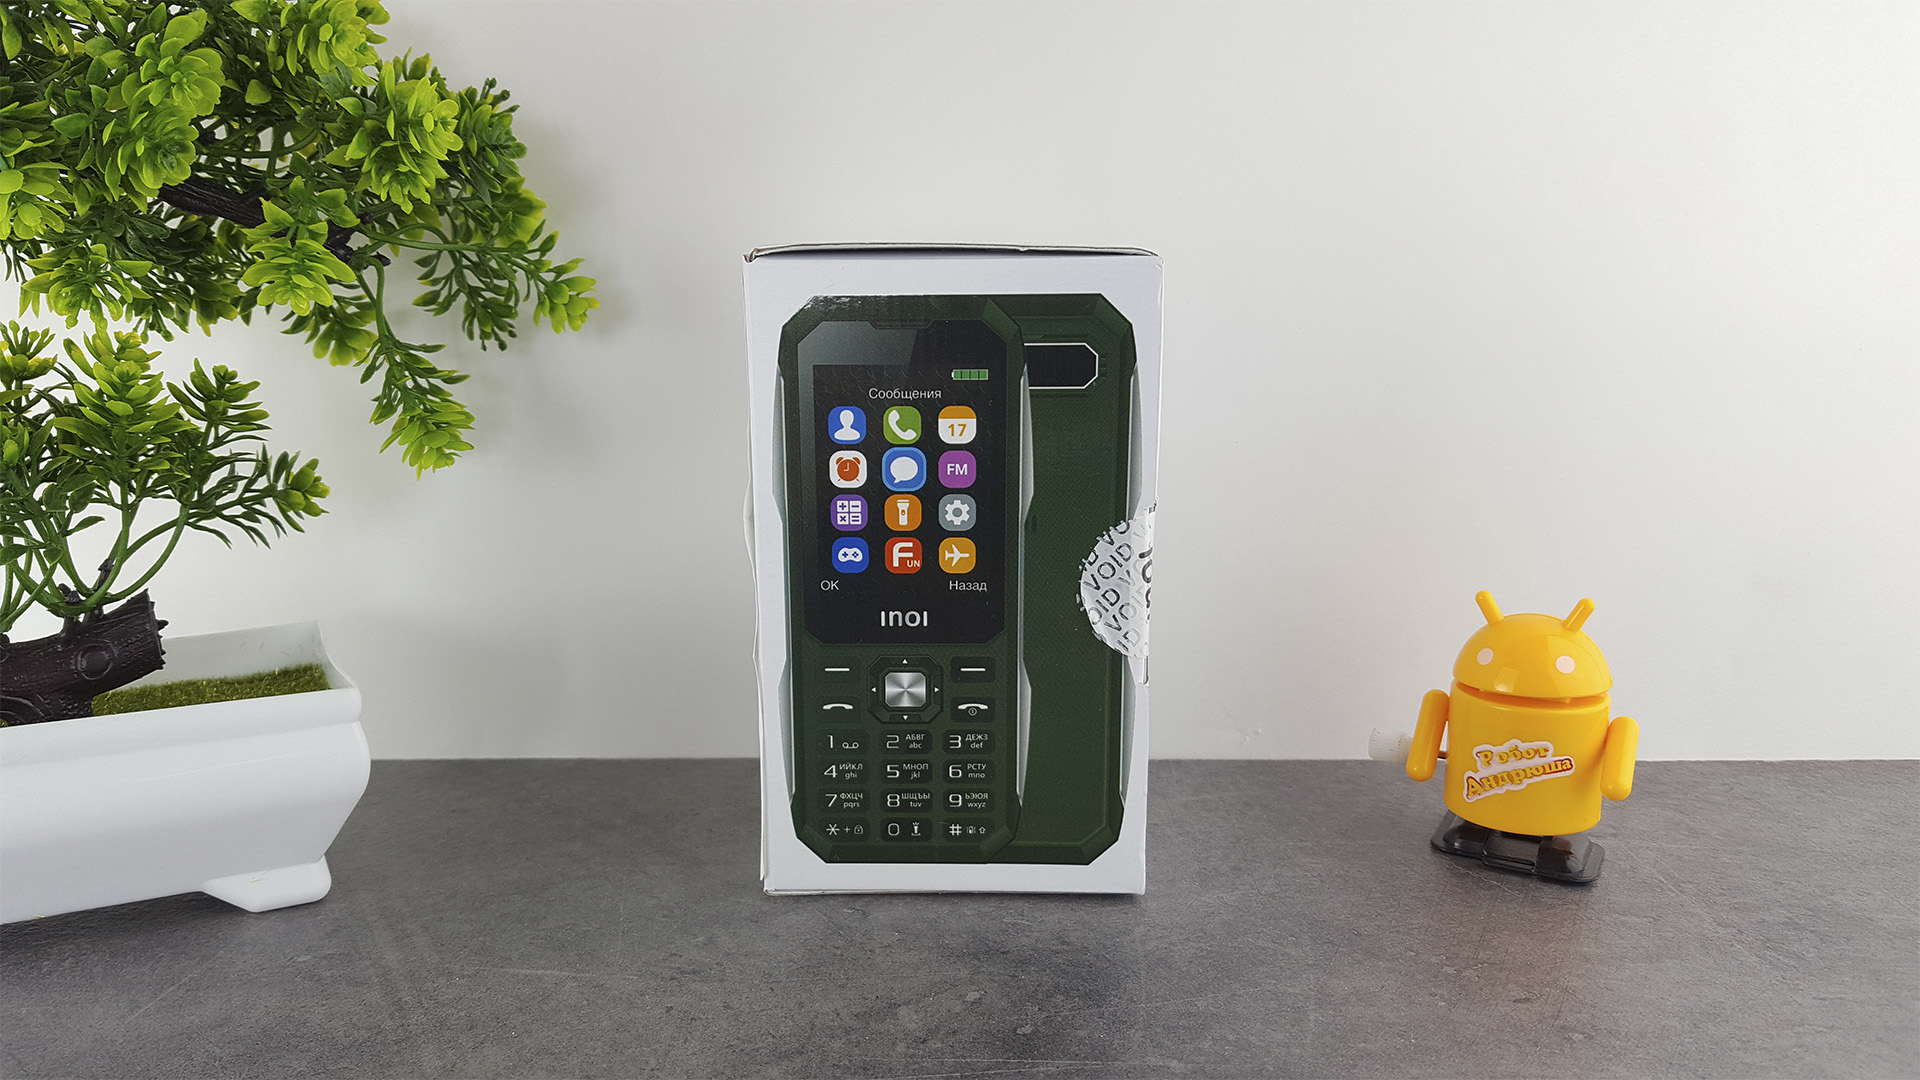 Обзор военного телефона INOI 244Z коробка